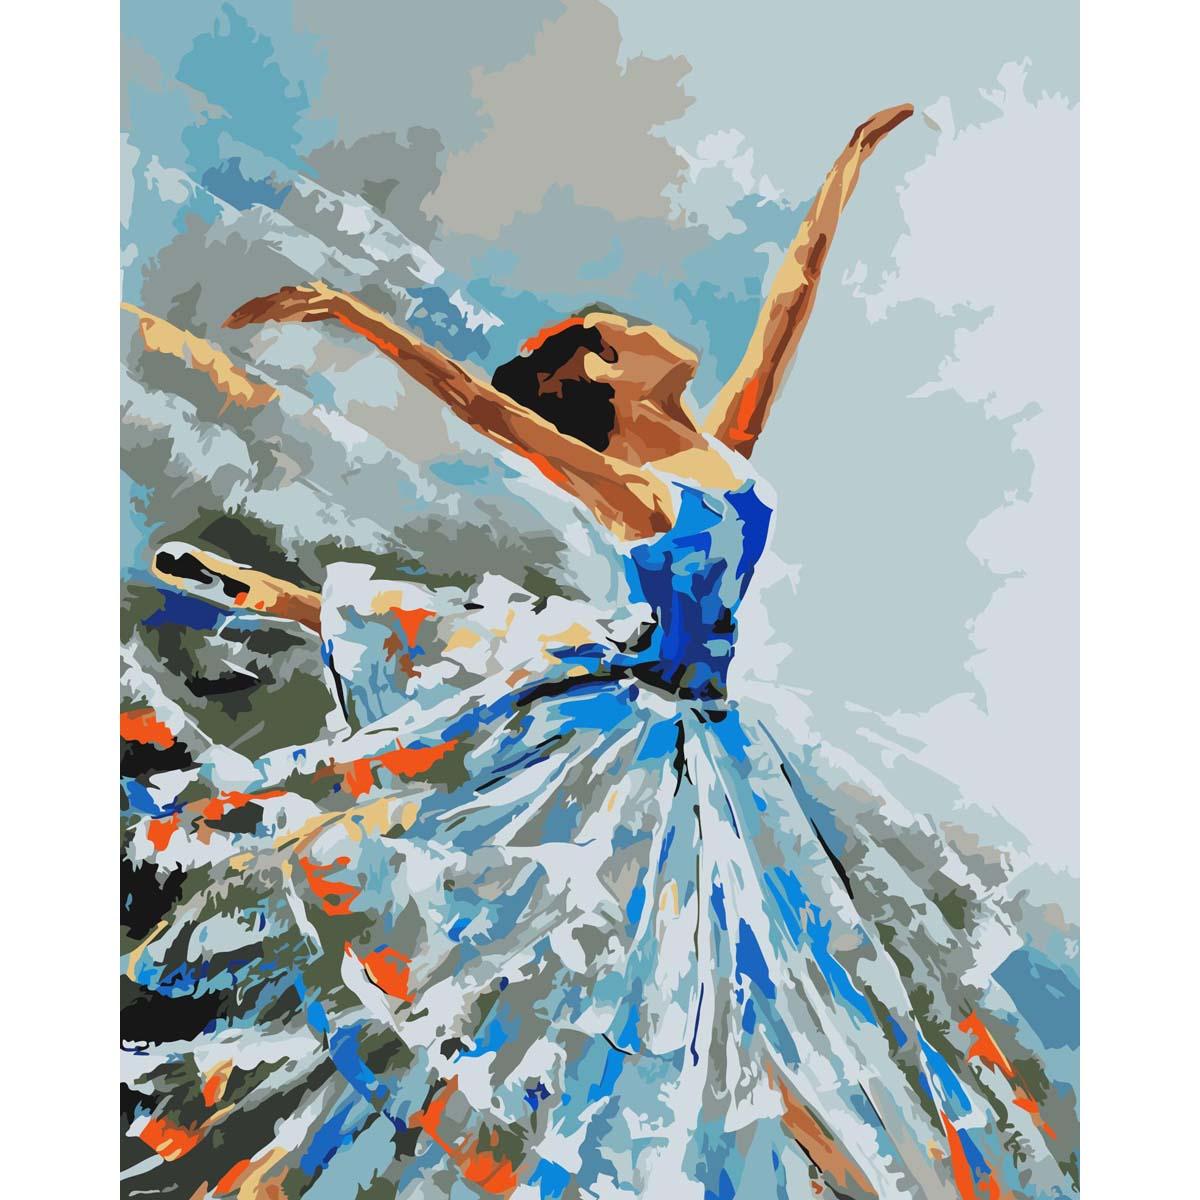 J001 Набор для рисования по номерам 'Балерина' 40*50см